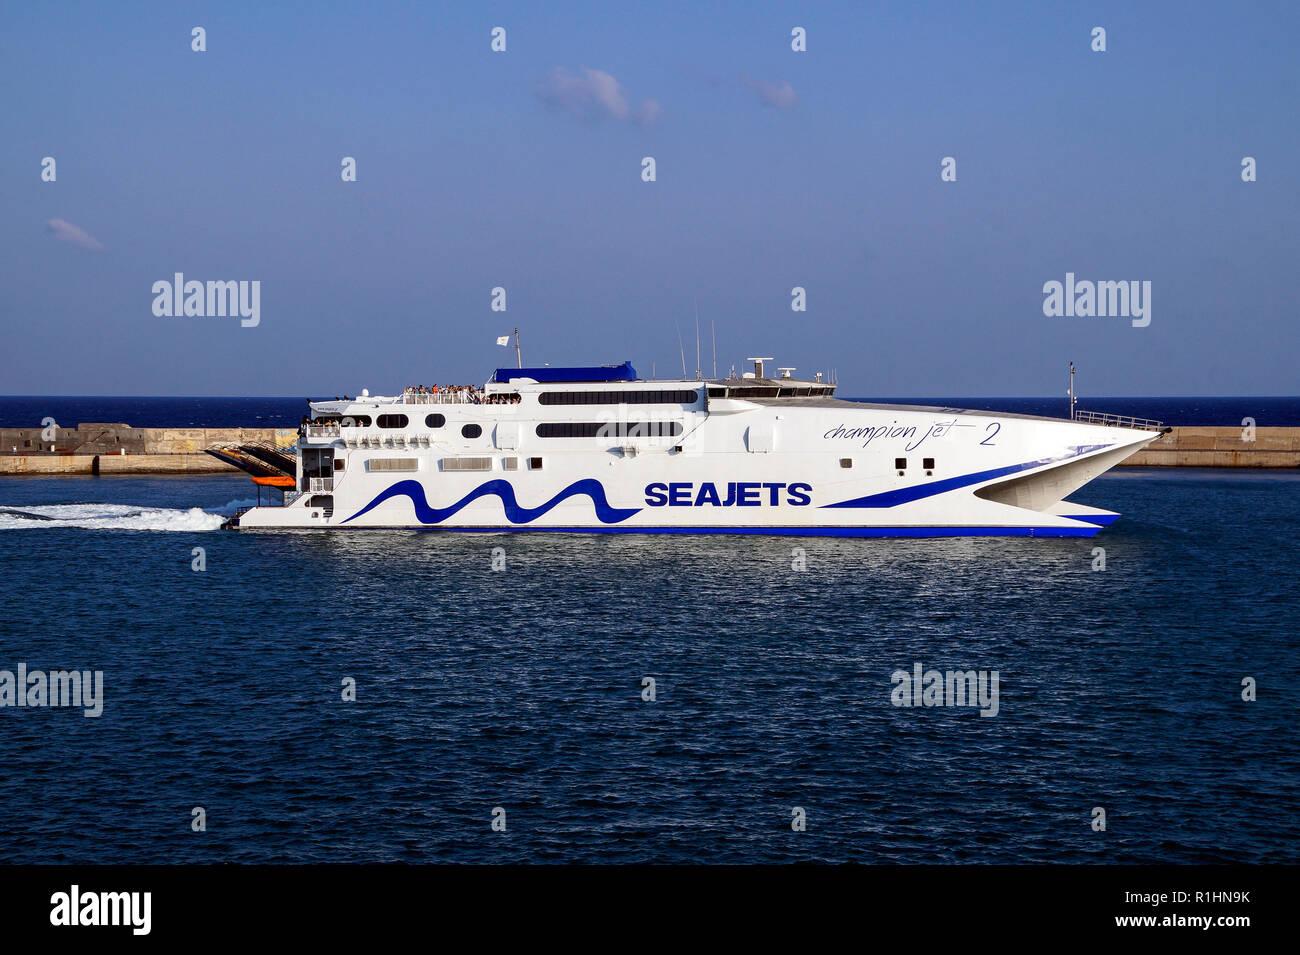 Seajets catamaran Champion 2 leaving the harbour in Heraklion Crete Greece Europe - Stock Image